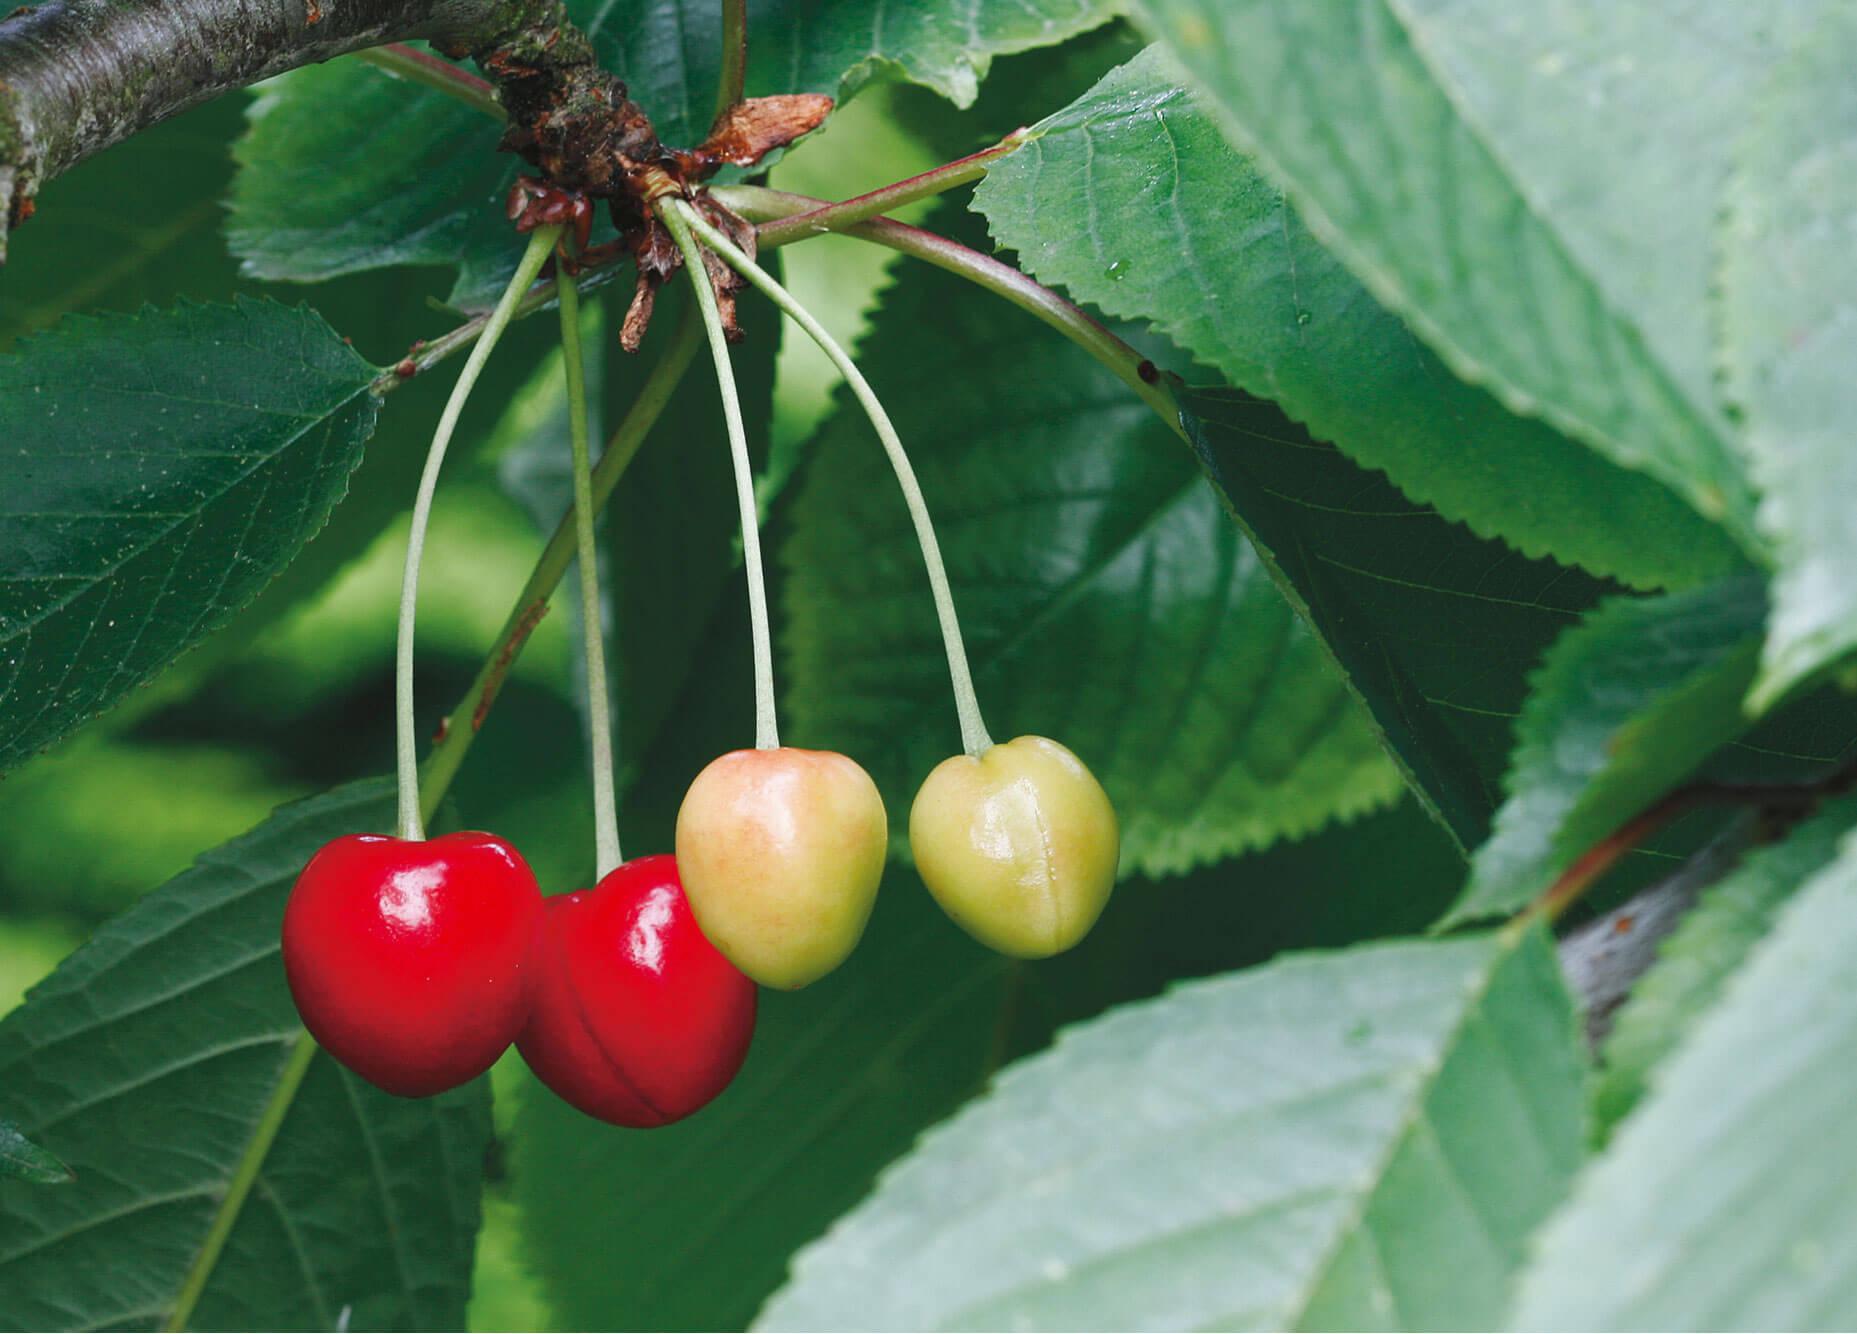 Cerise vert rouge feuille fruit